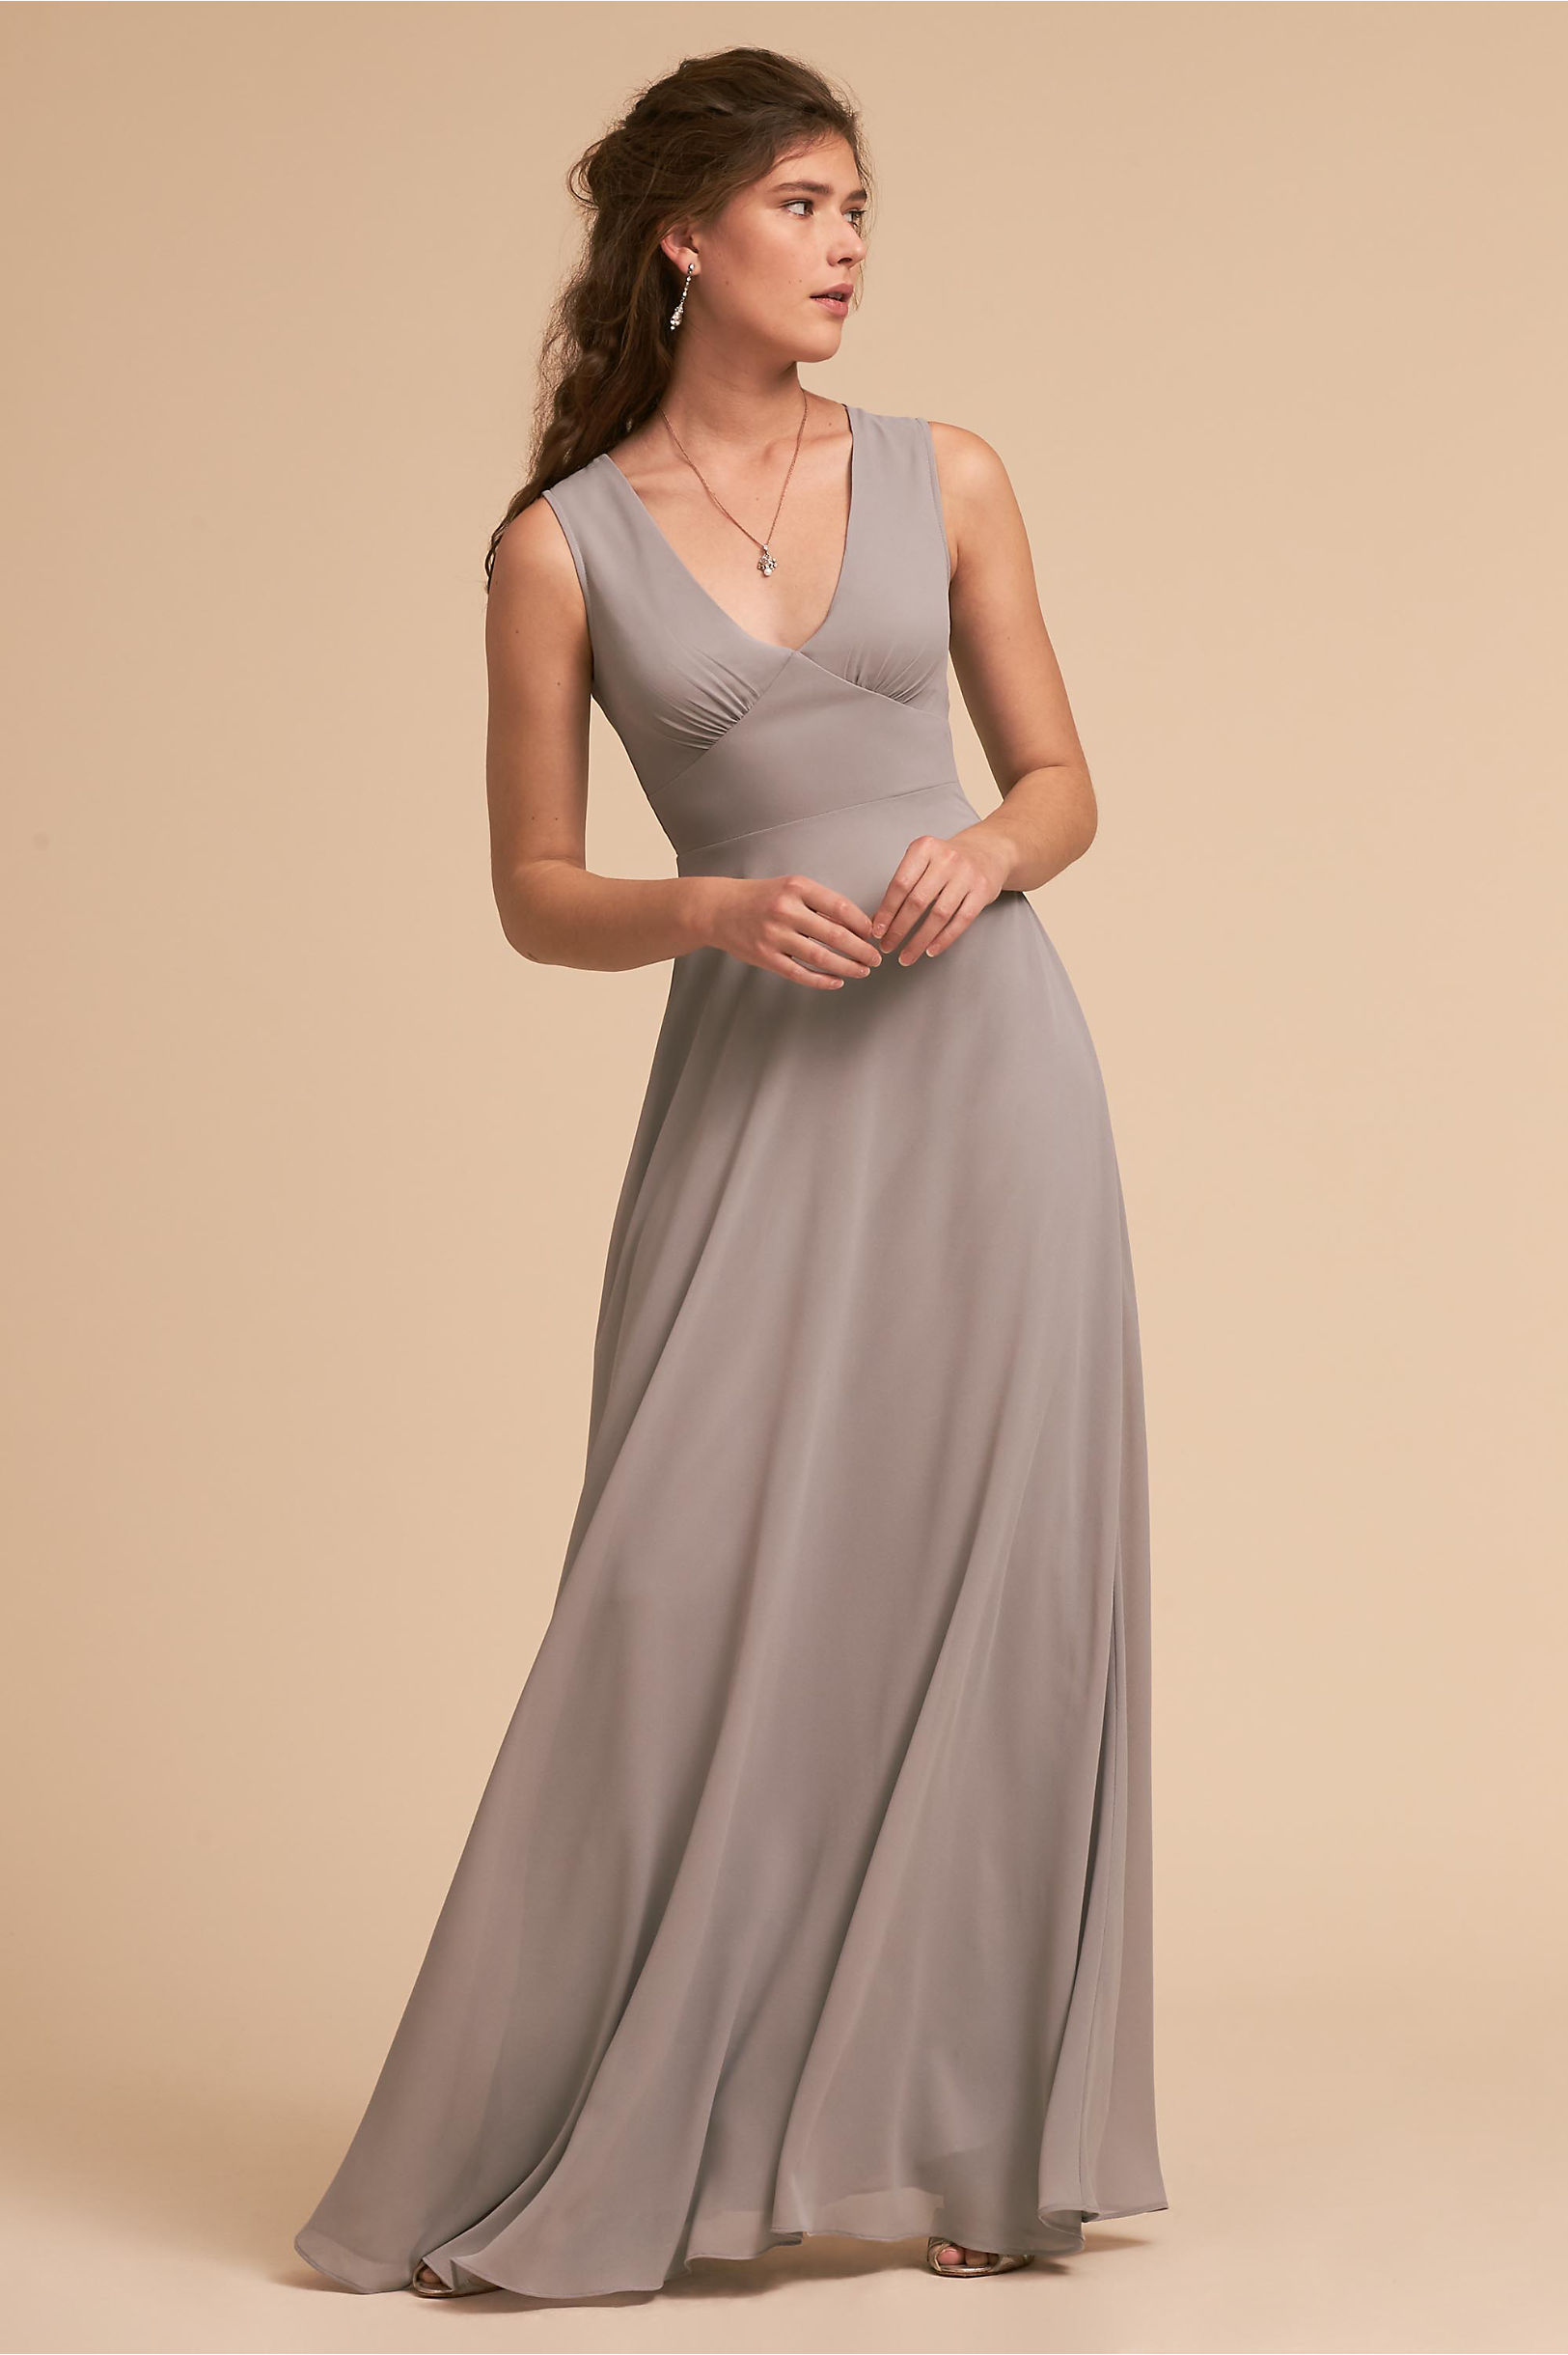 Black & Grey Bridesmaid Dresses | BHLDN